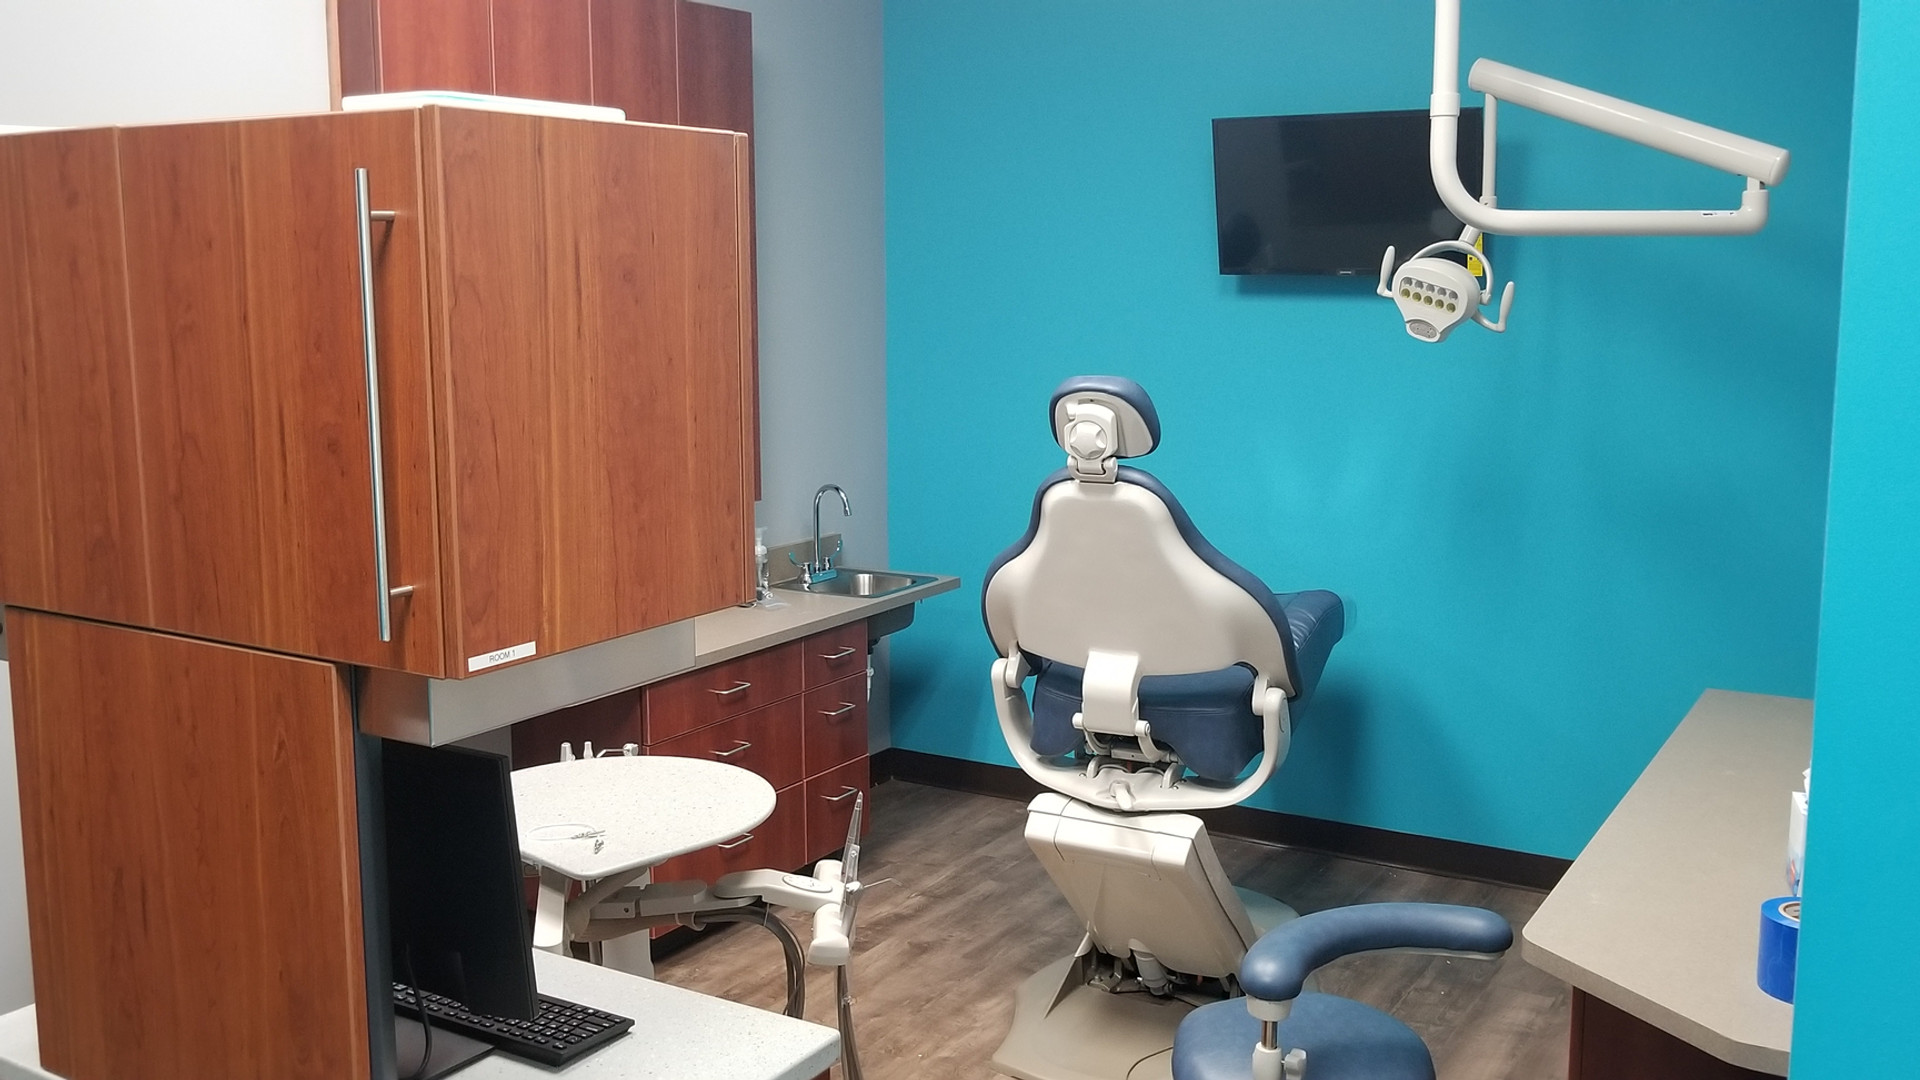 Room for Patients - Buildout Pros